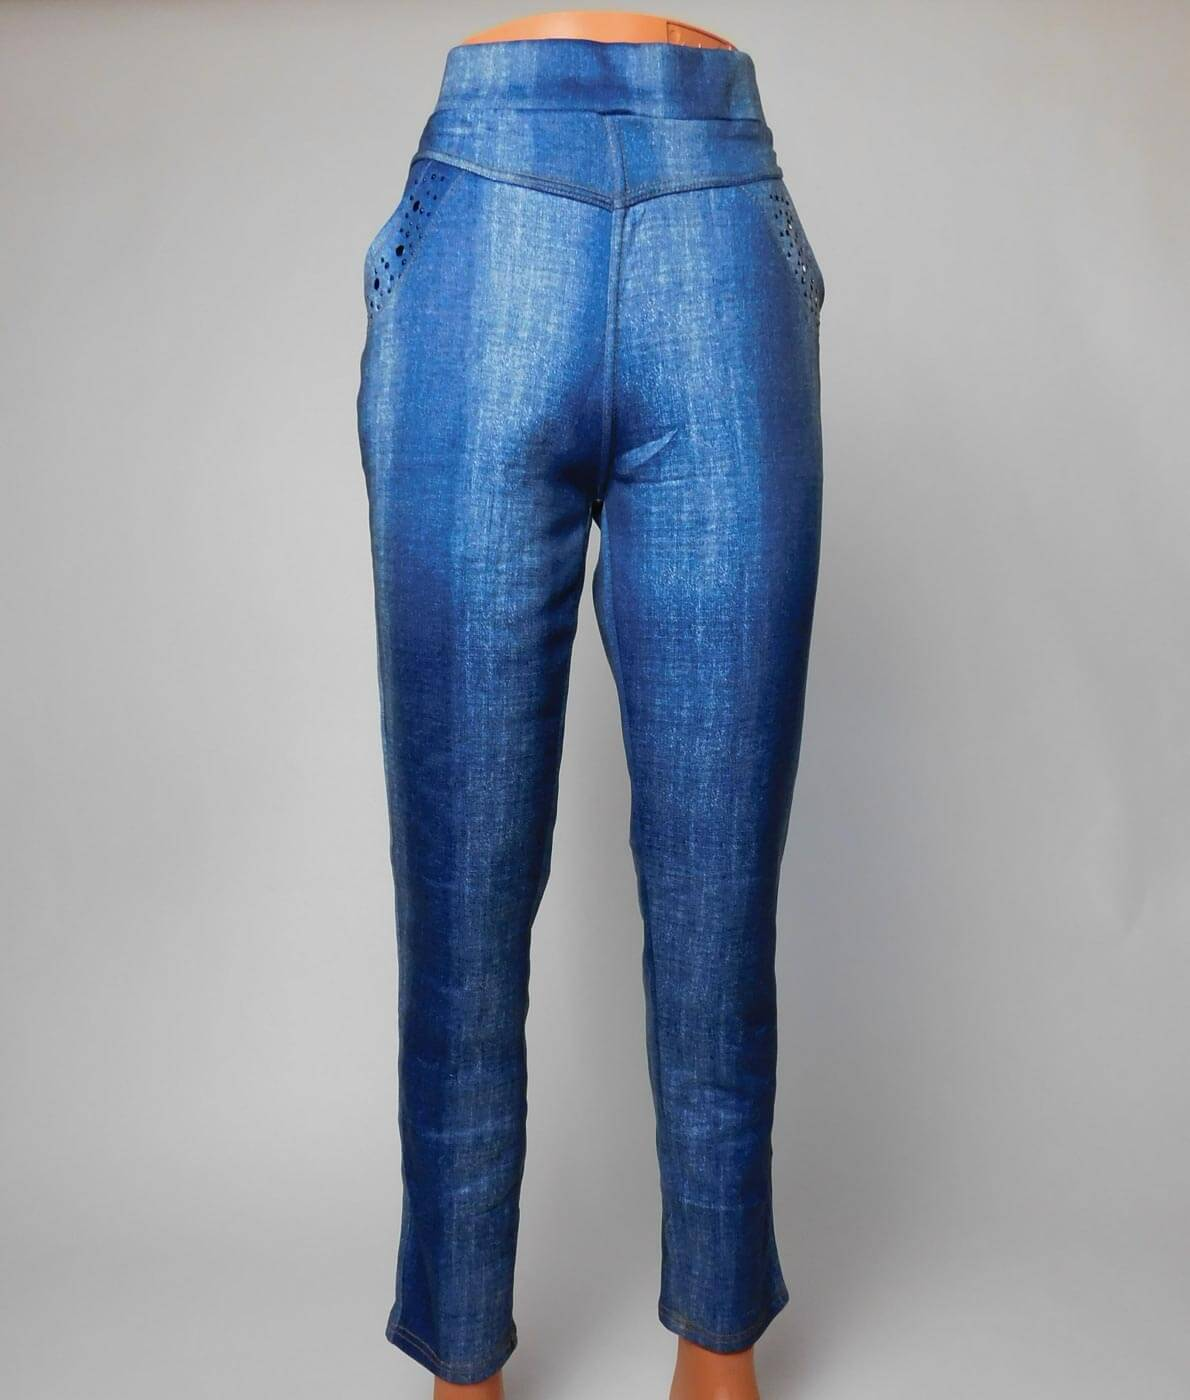 edea8ccea0c0 Nagyméretű farmer hatású vastag téli leggings - N194-144 - Kék